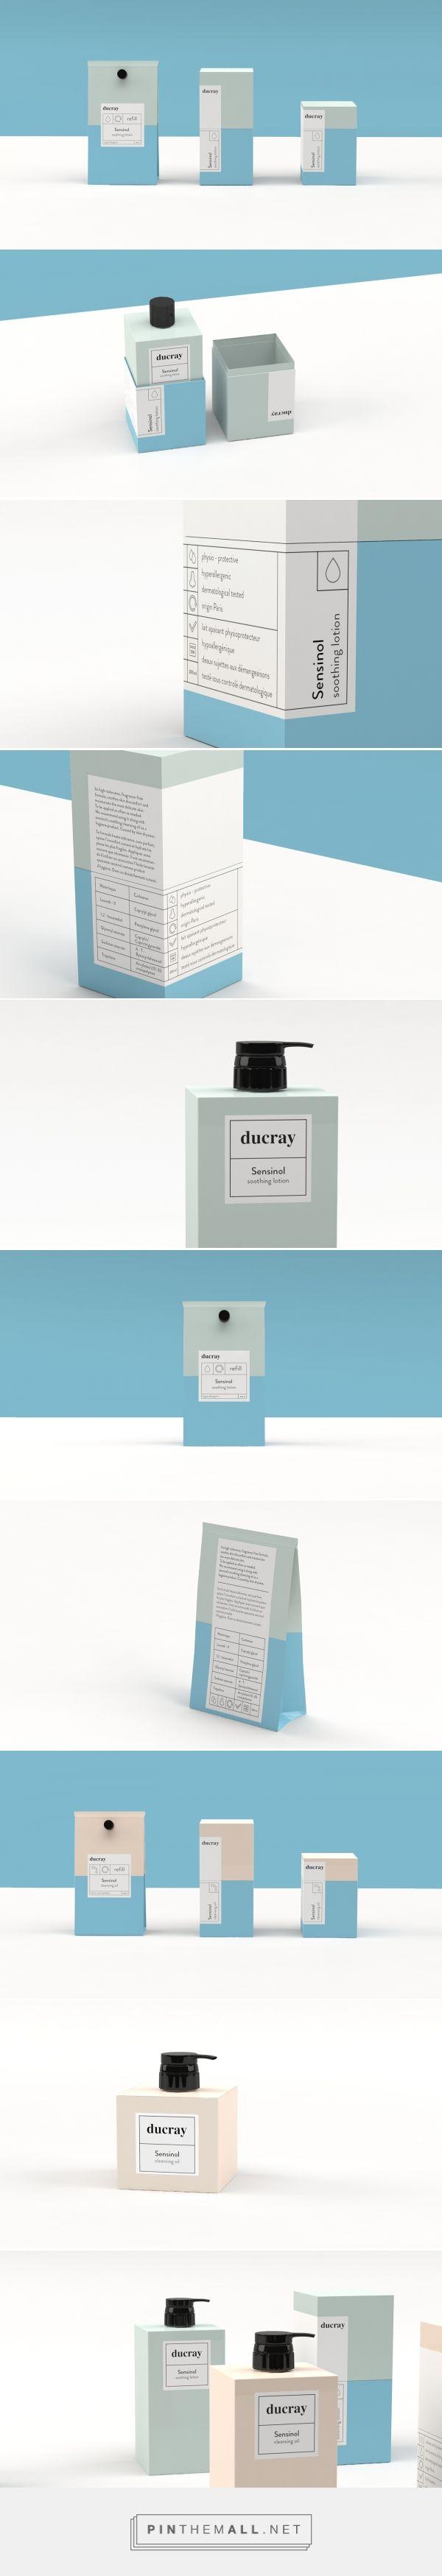 Ducray Sensinol - Rebranding on Behance - created on 2015-09-04 16:41:48